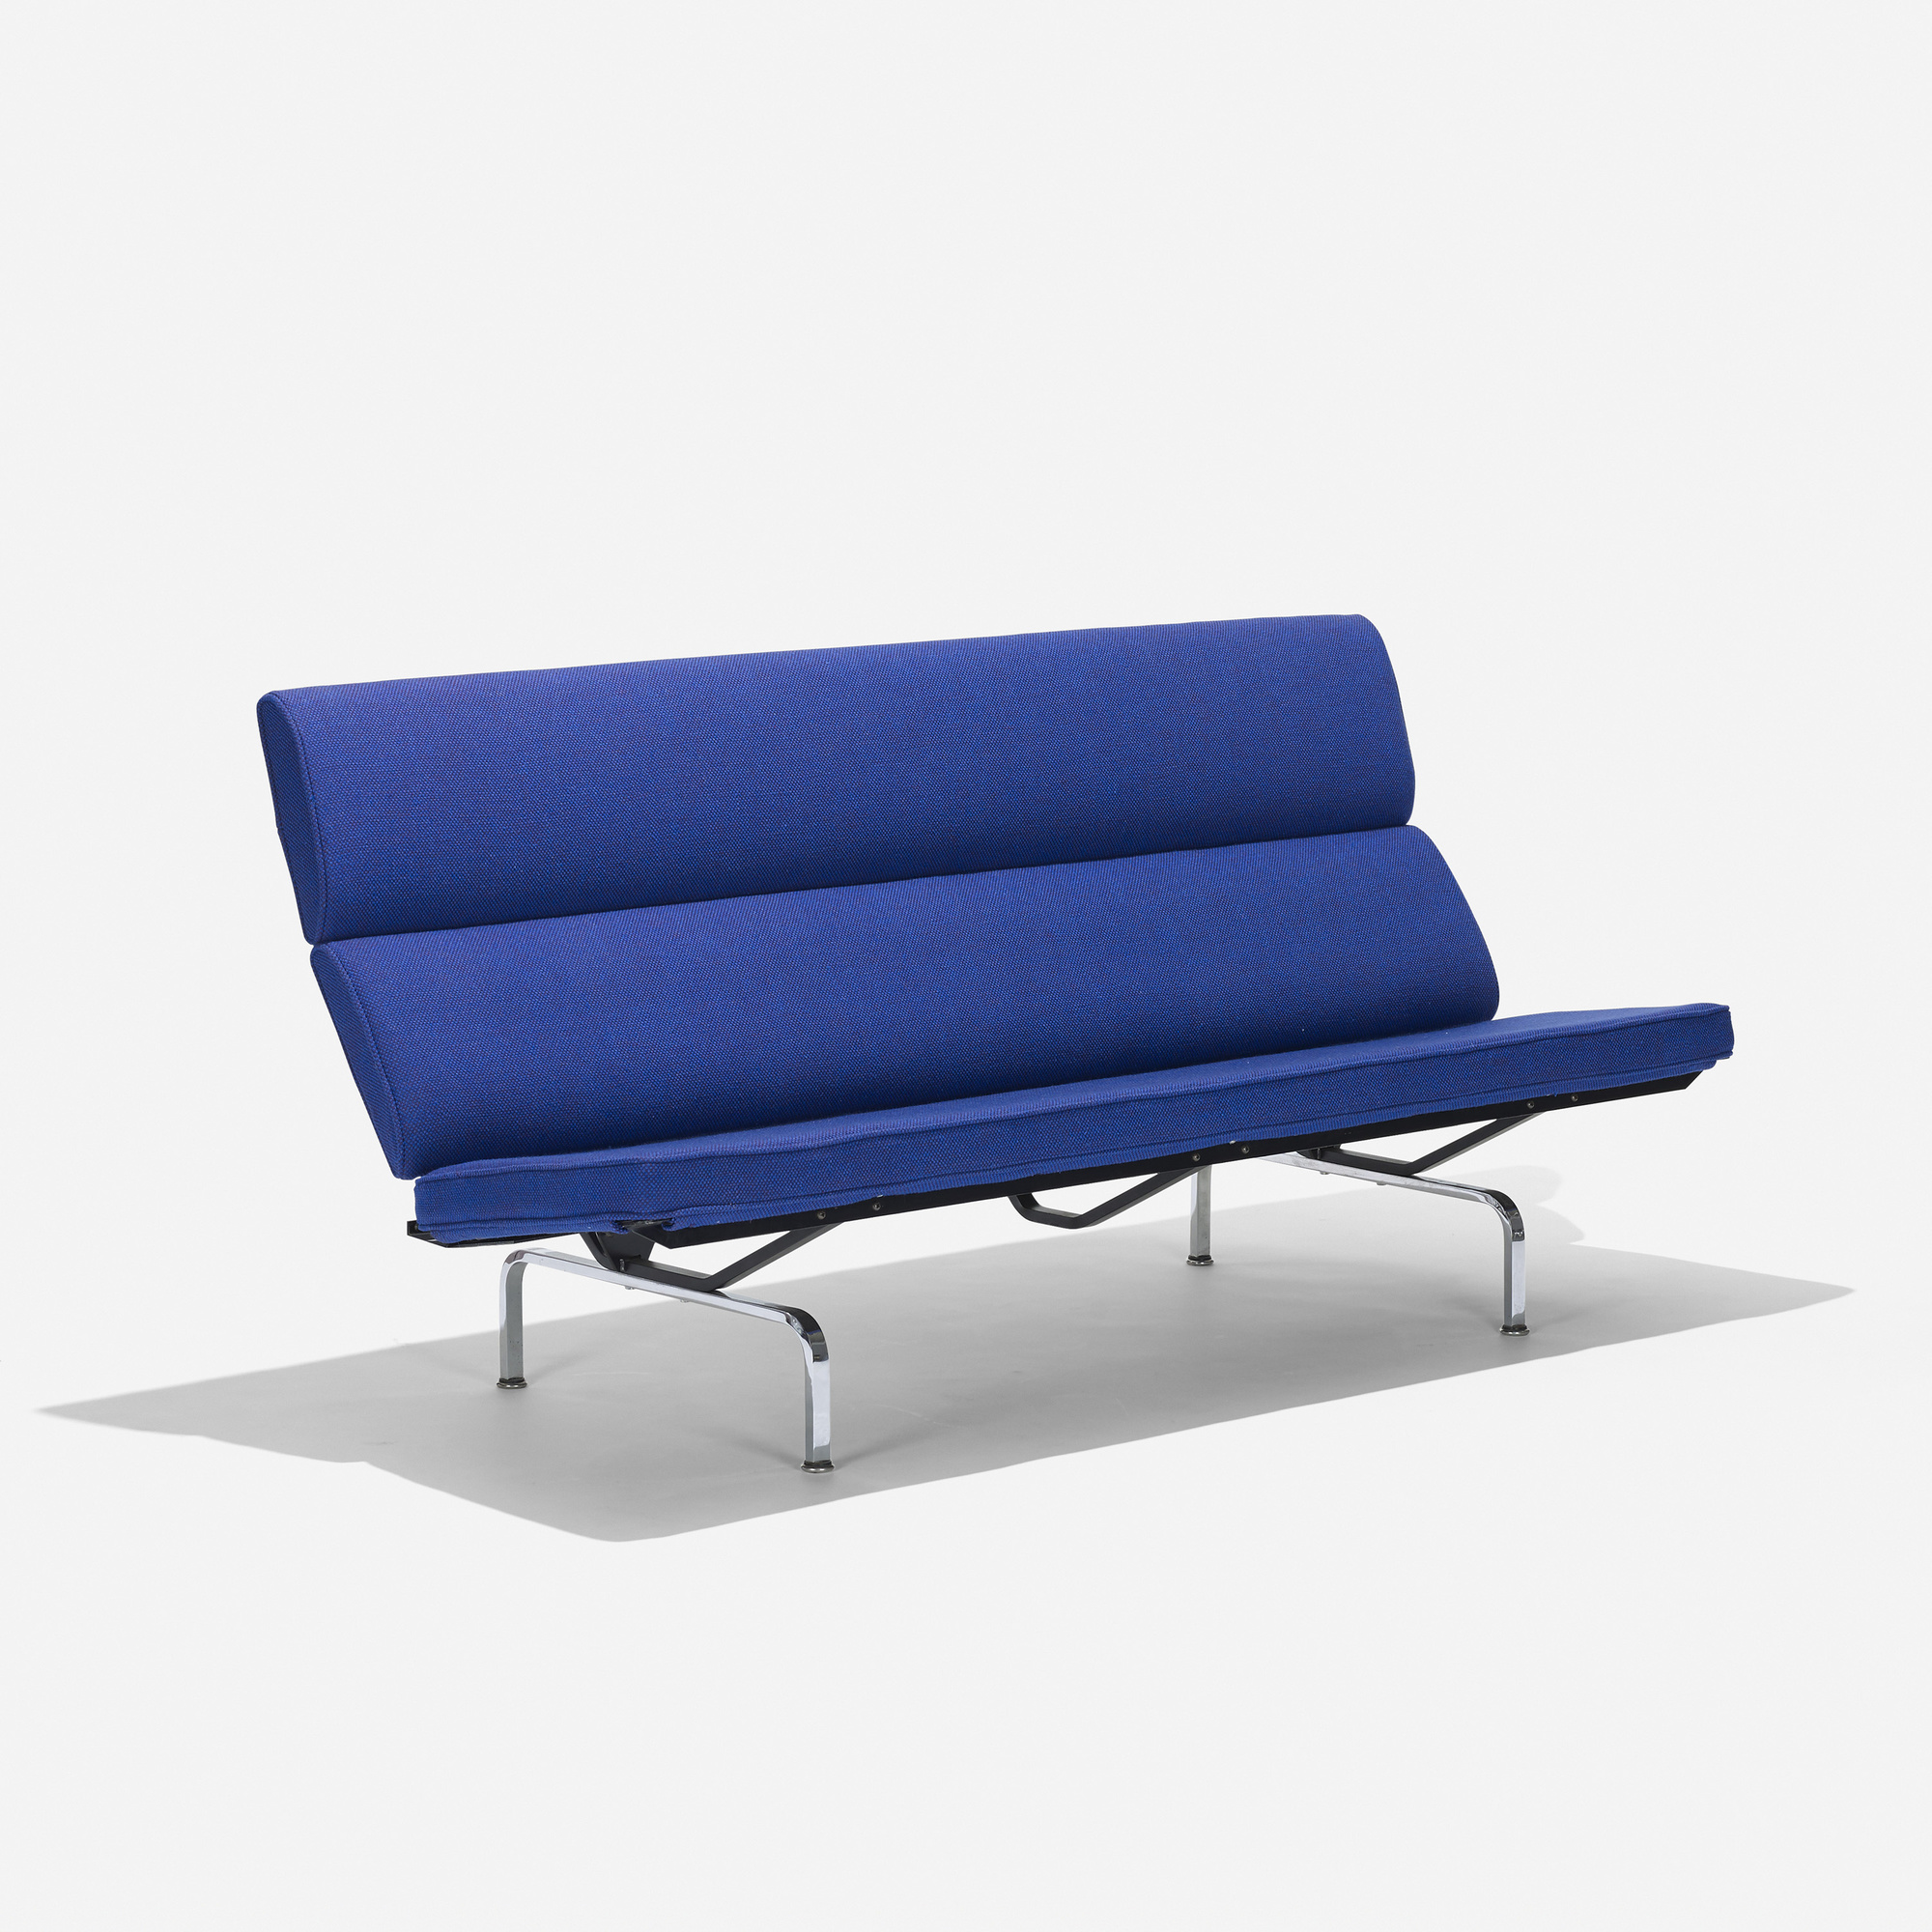 eames sofa compact slipcover nz 311 charles and ray